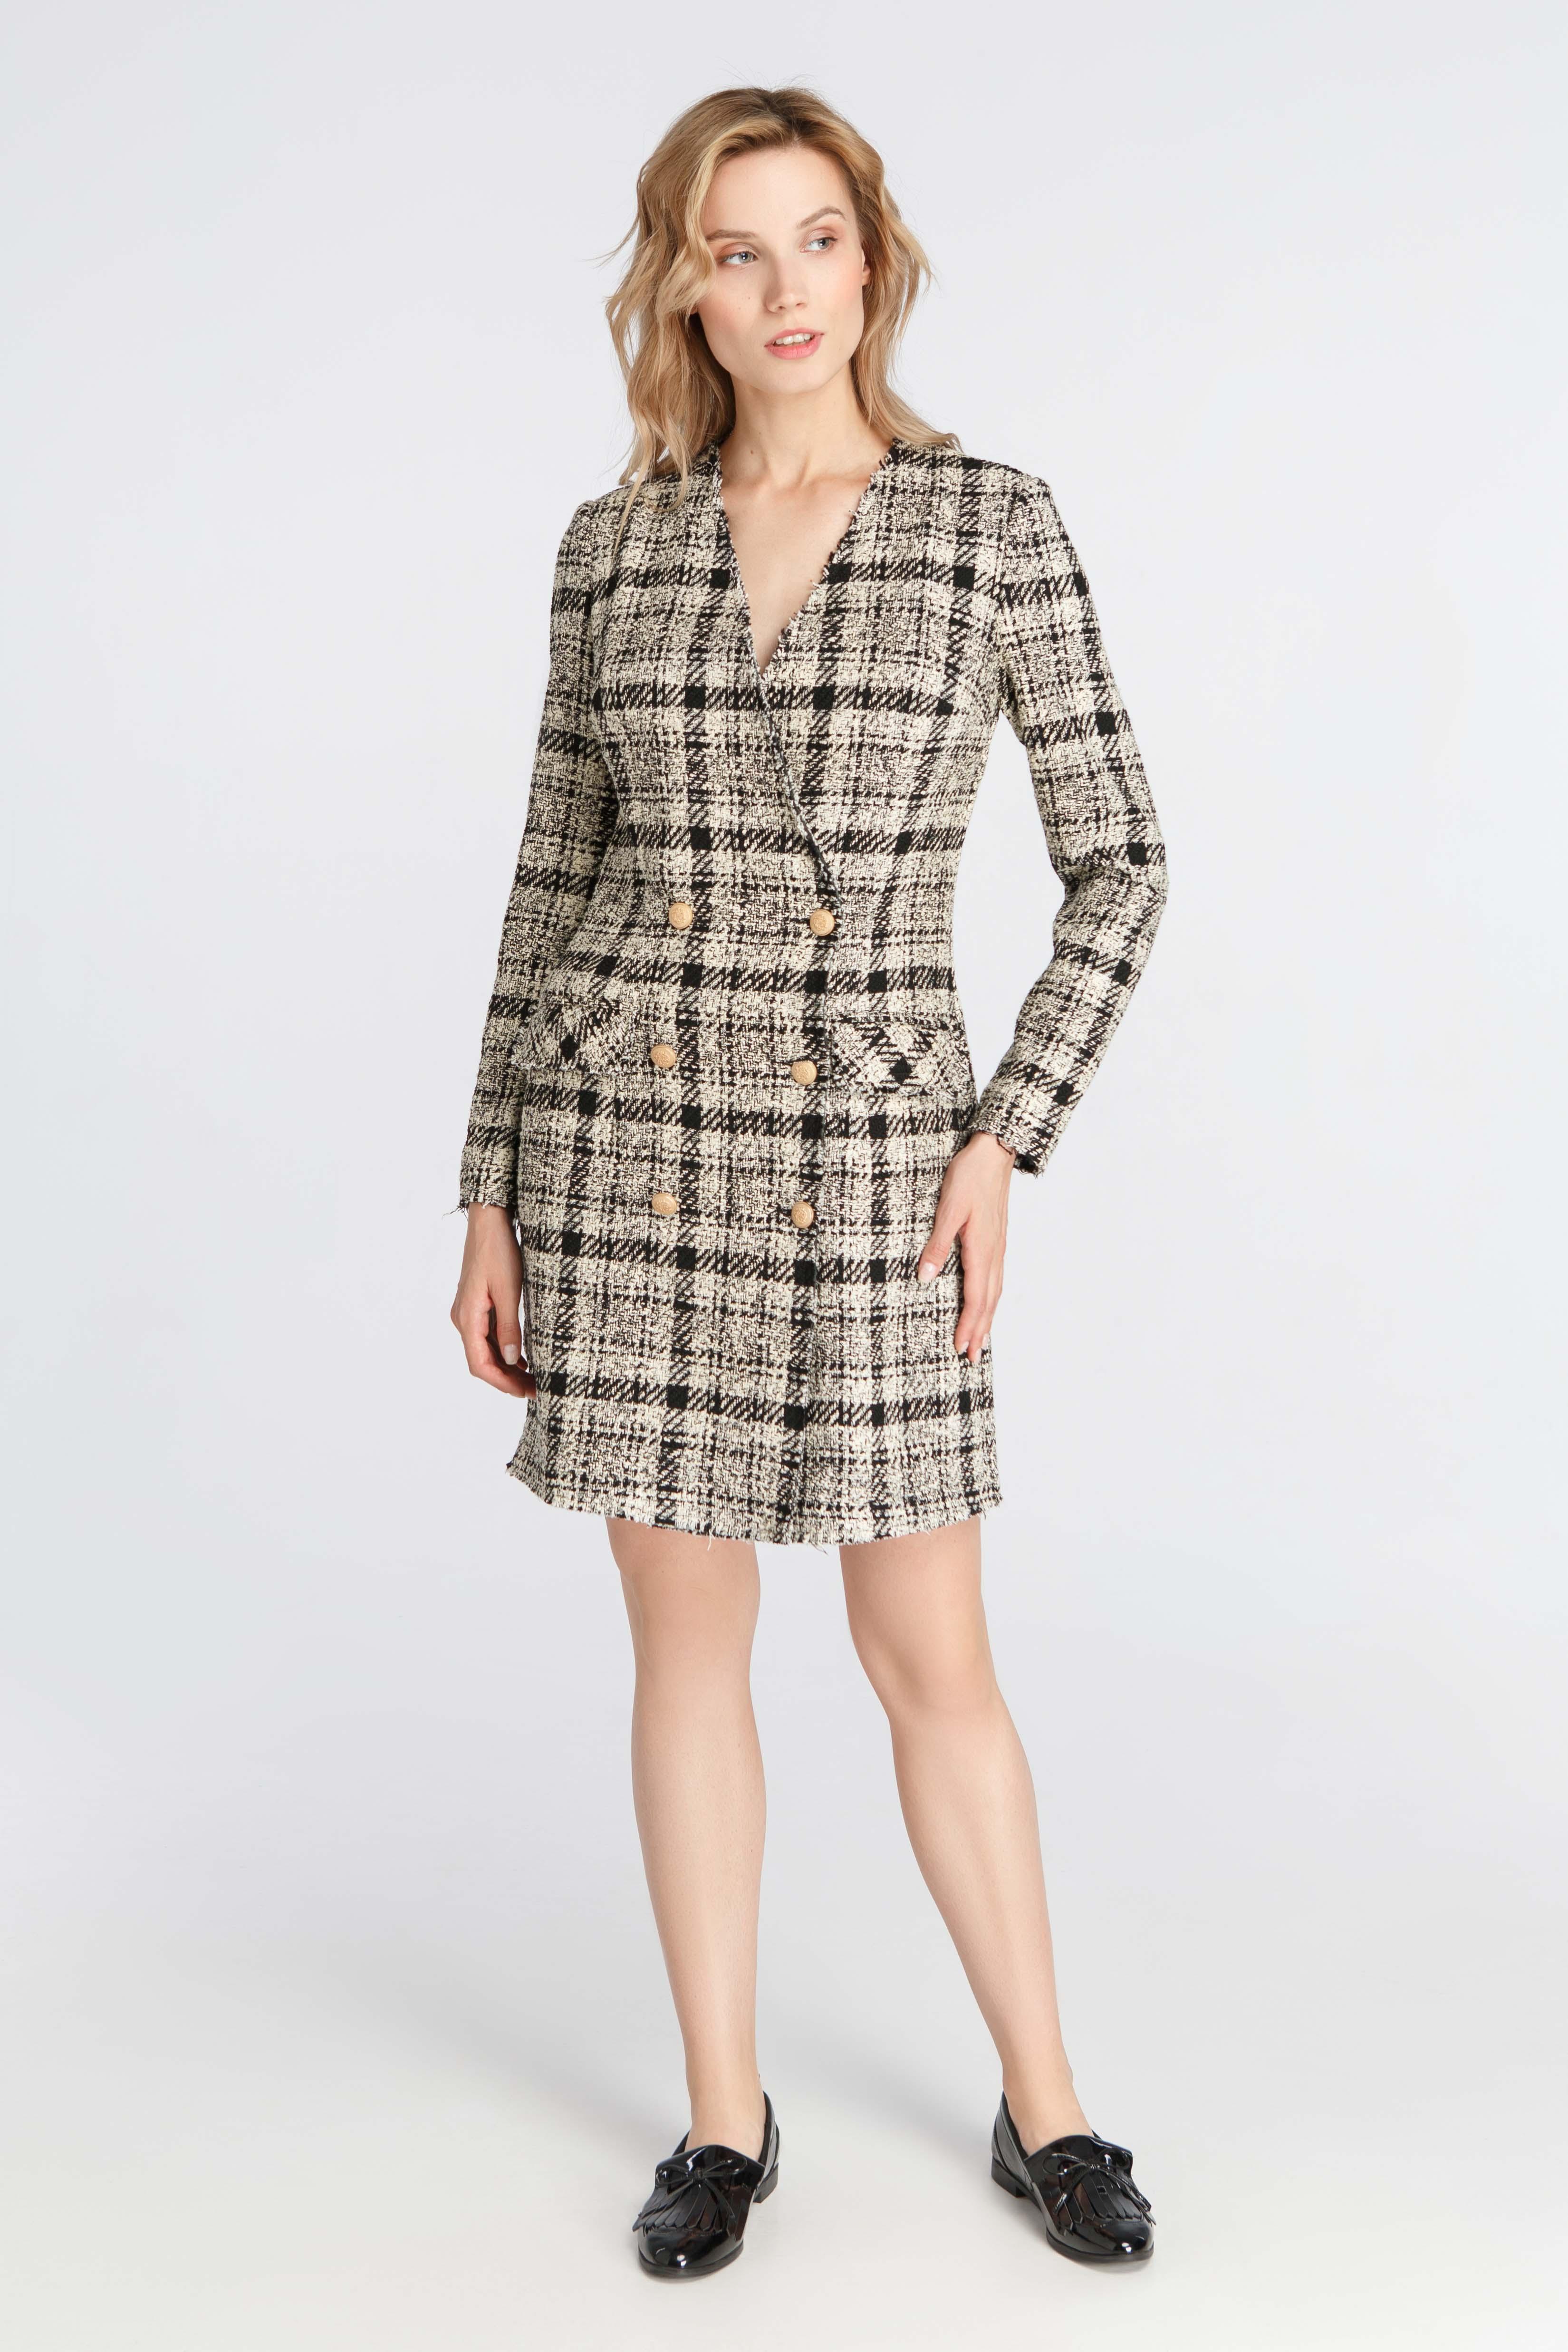 Платье женские MustHave модель 7142 приобрести, 2017